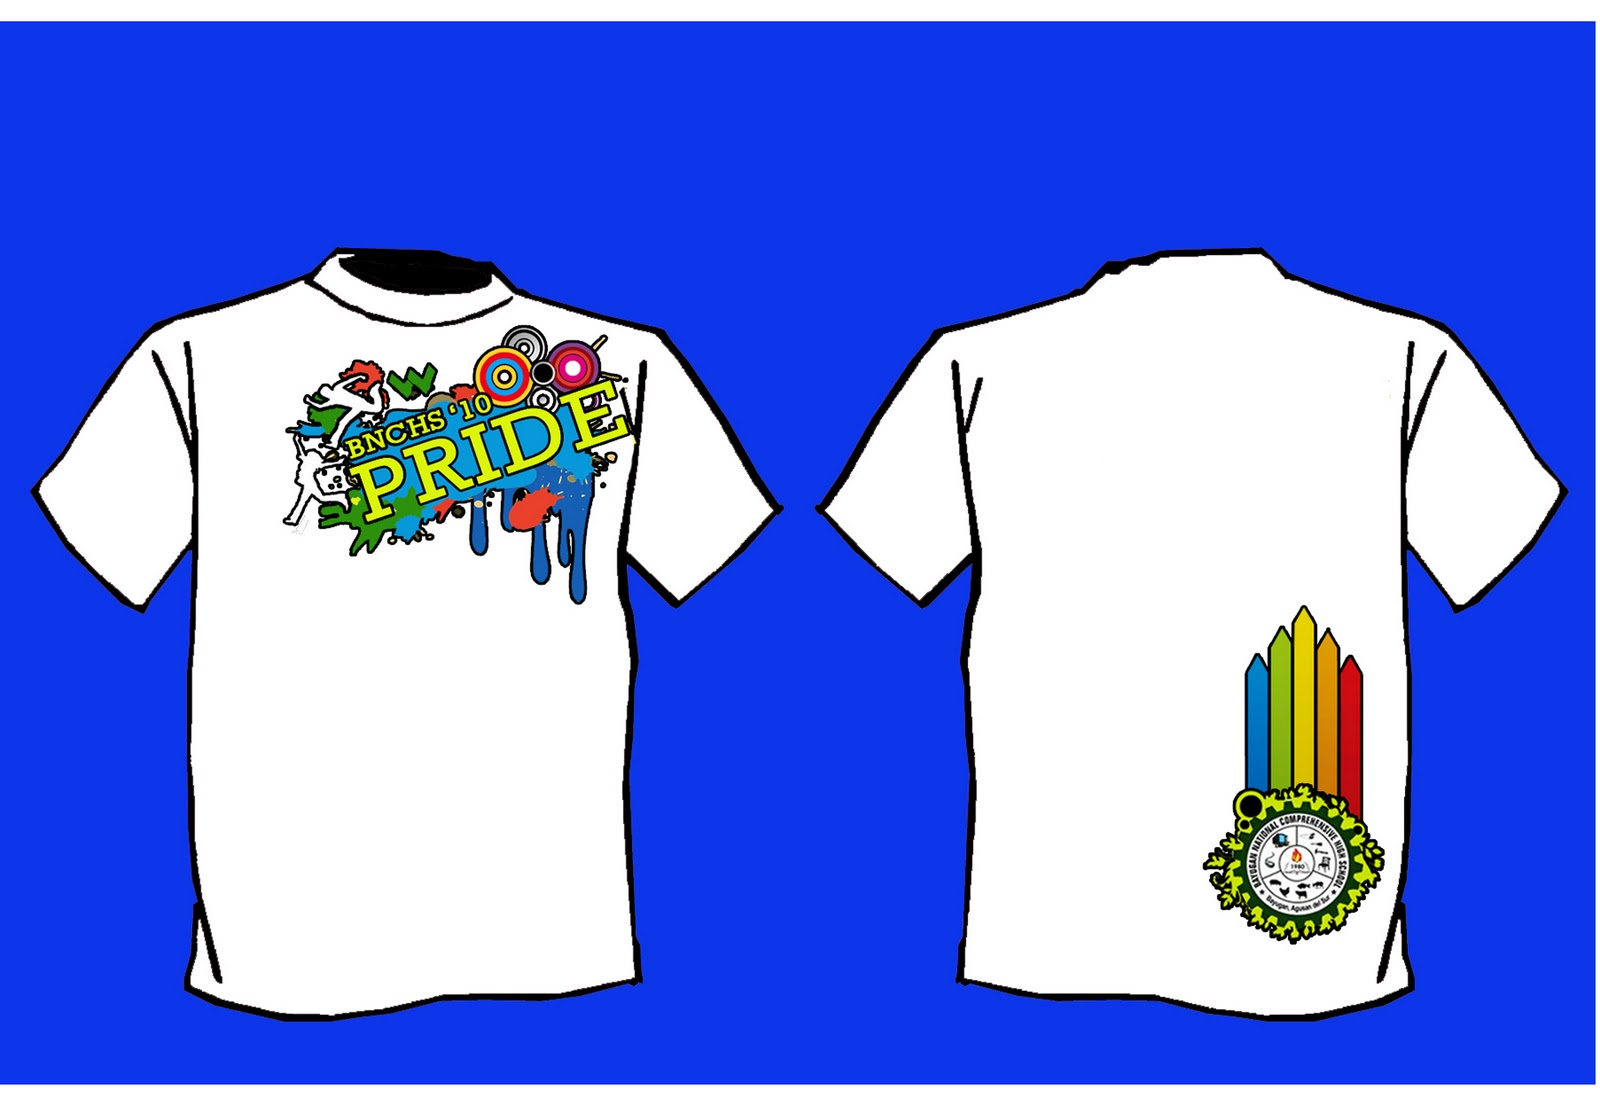 Shirt design for alumni homecoming - T Shirt Design